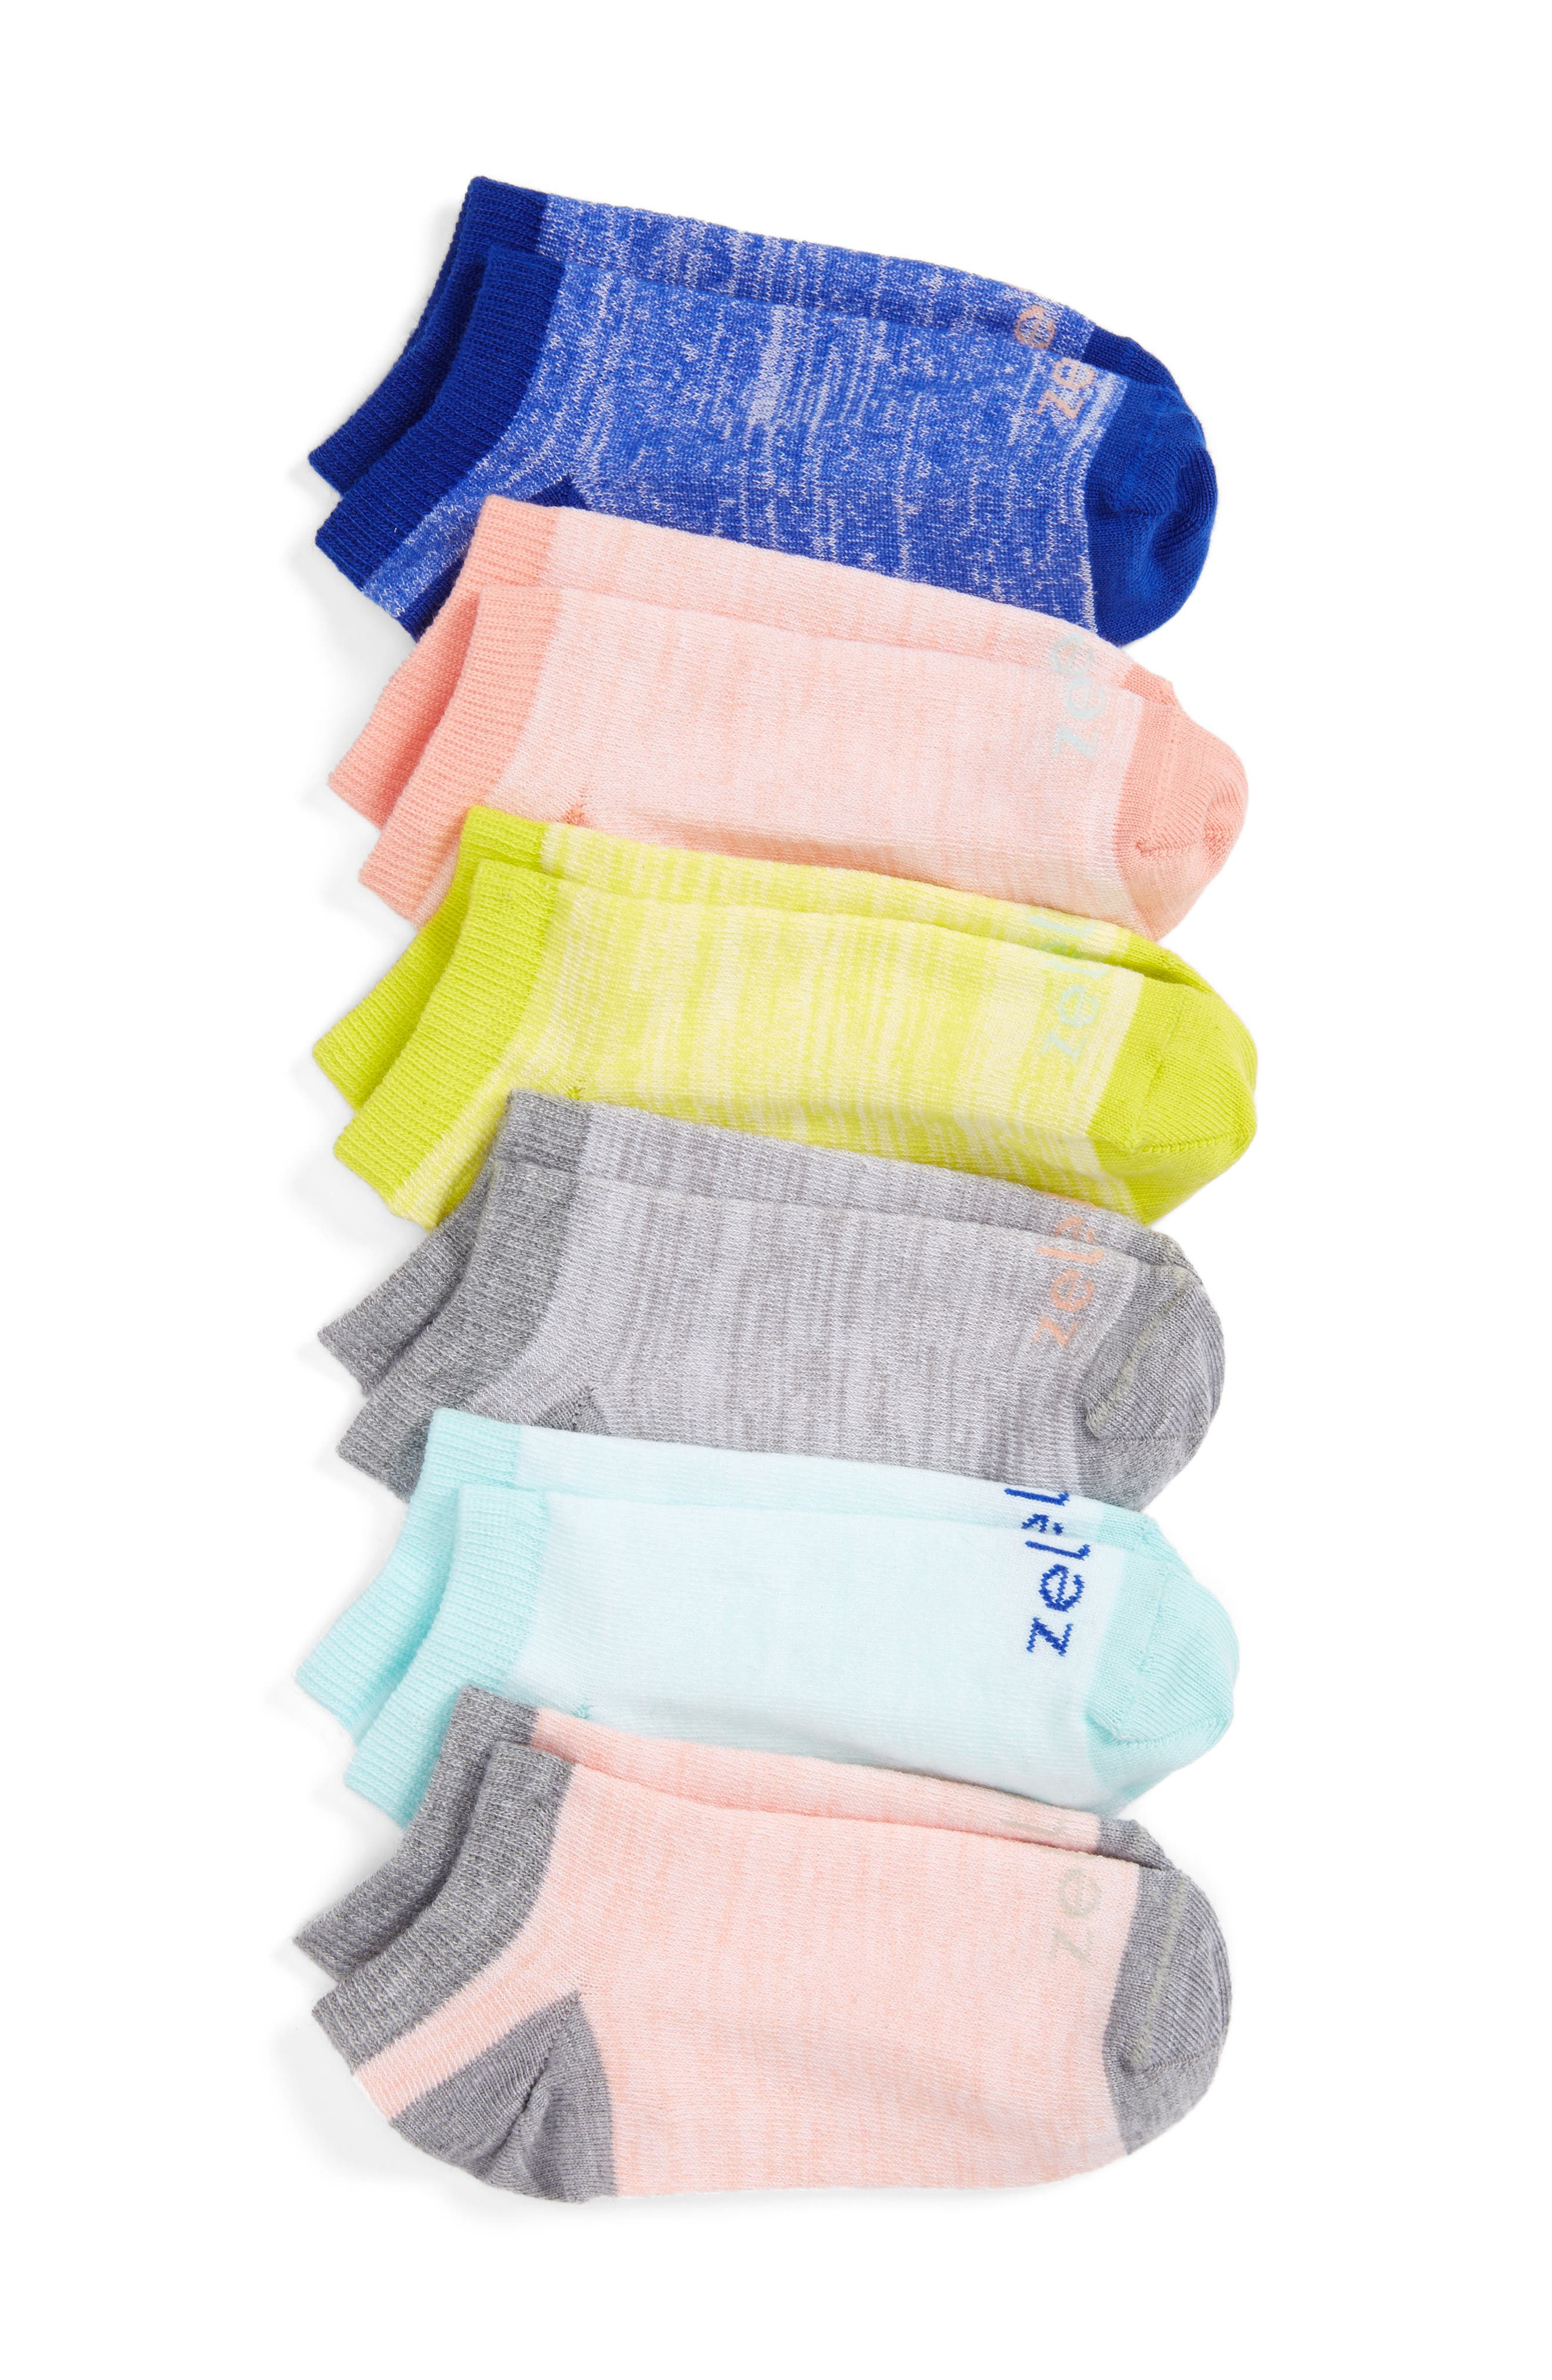 6-Pack Ankle Socks,                             Main thumbnail 1, color,                             Pink Salt